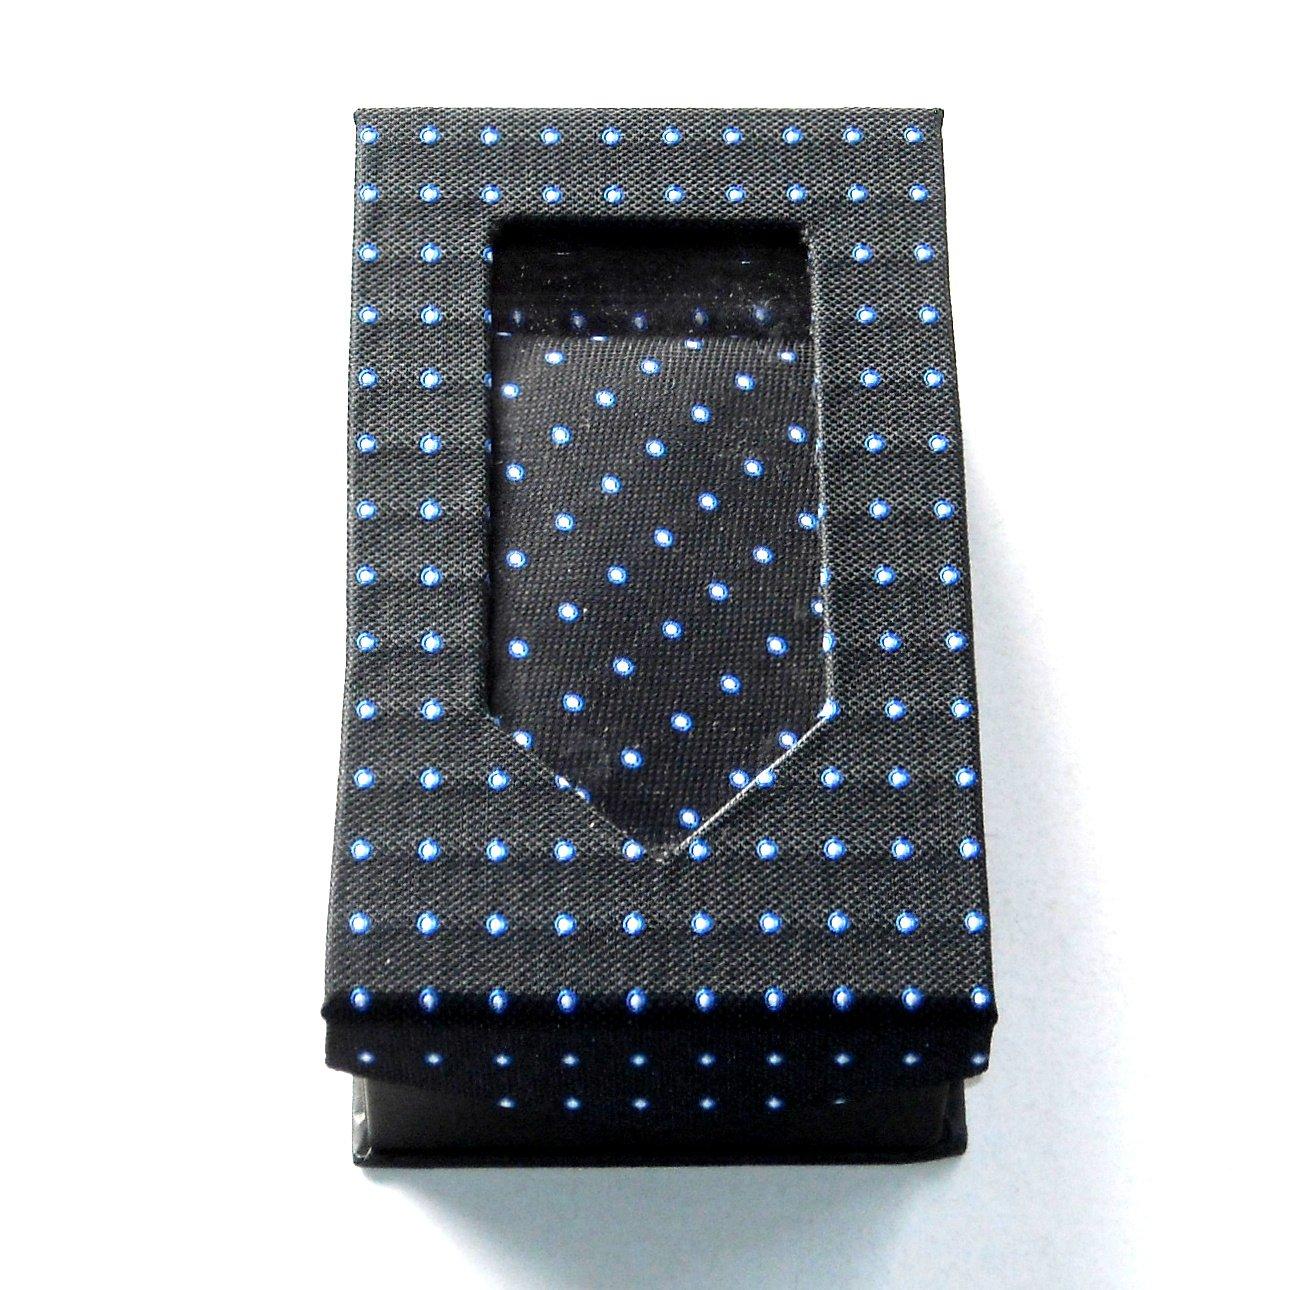 Black Tie Gift Set Boxed Handkerchief Cufflinks